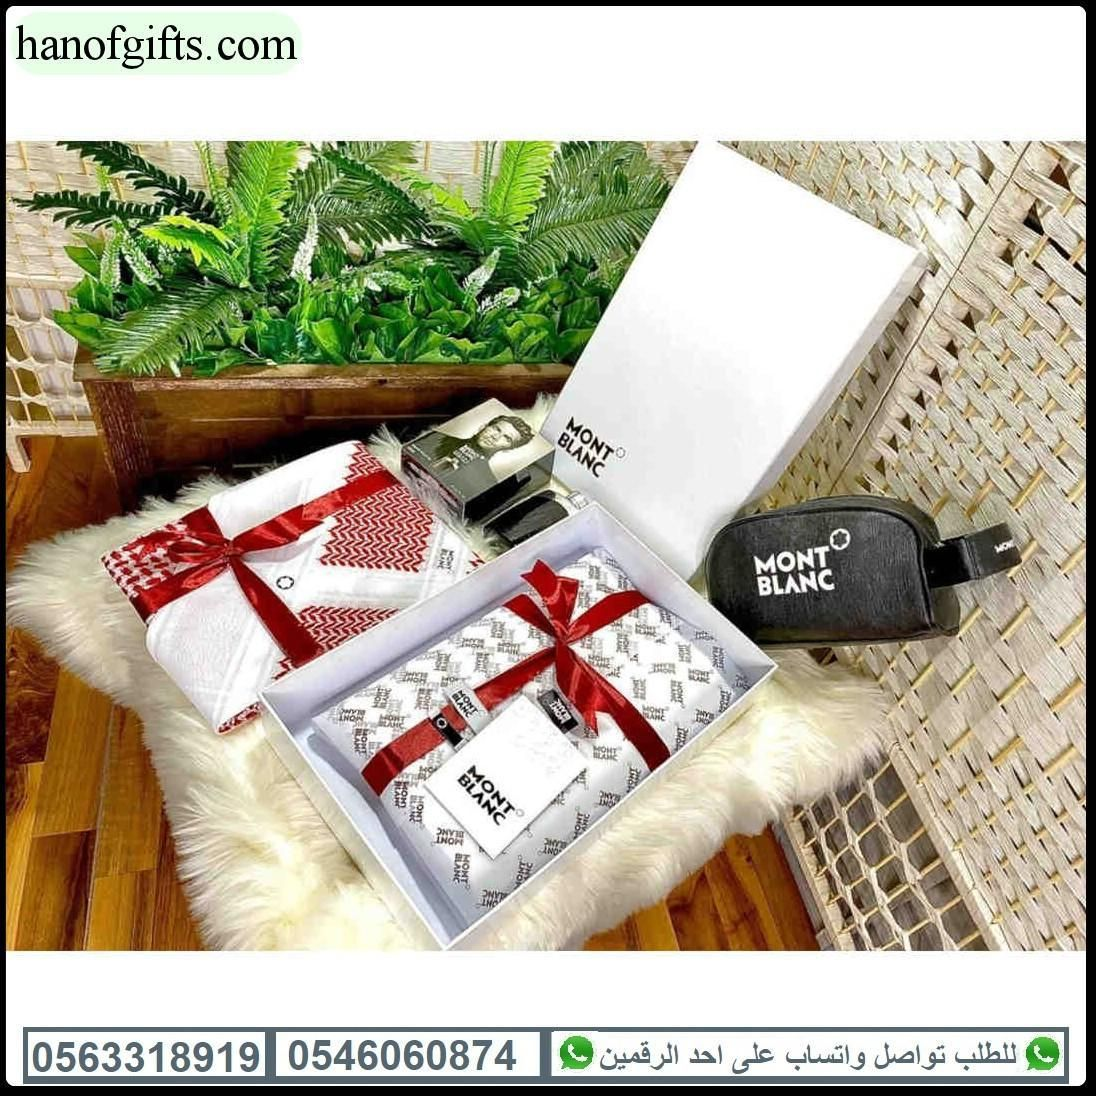 مونت بلانك قماش مع شماغ و عطر وشنطه عرض مميز مايفوتكم هدايا هنوف Gift Wrapping Gifts Wrap